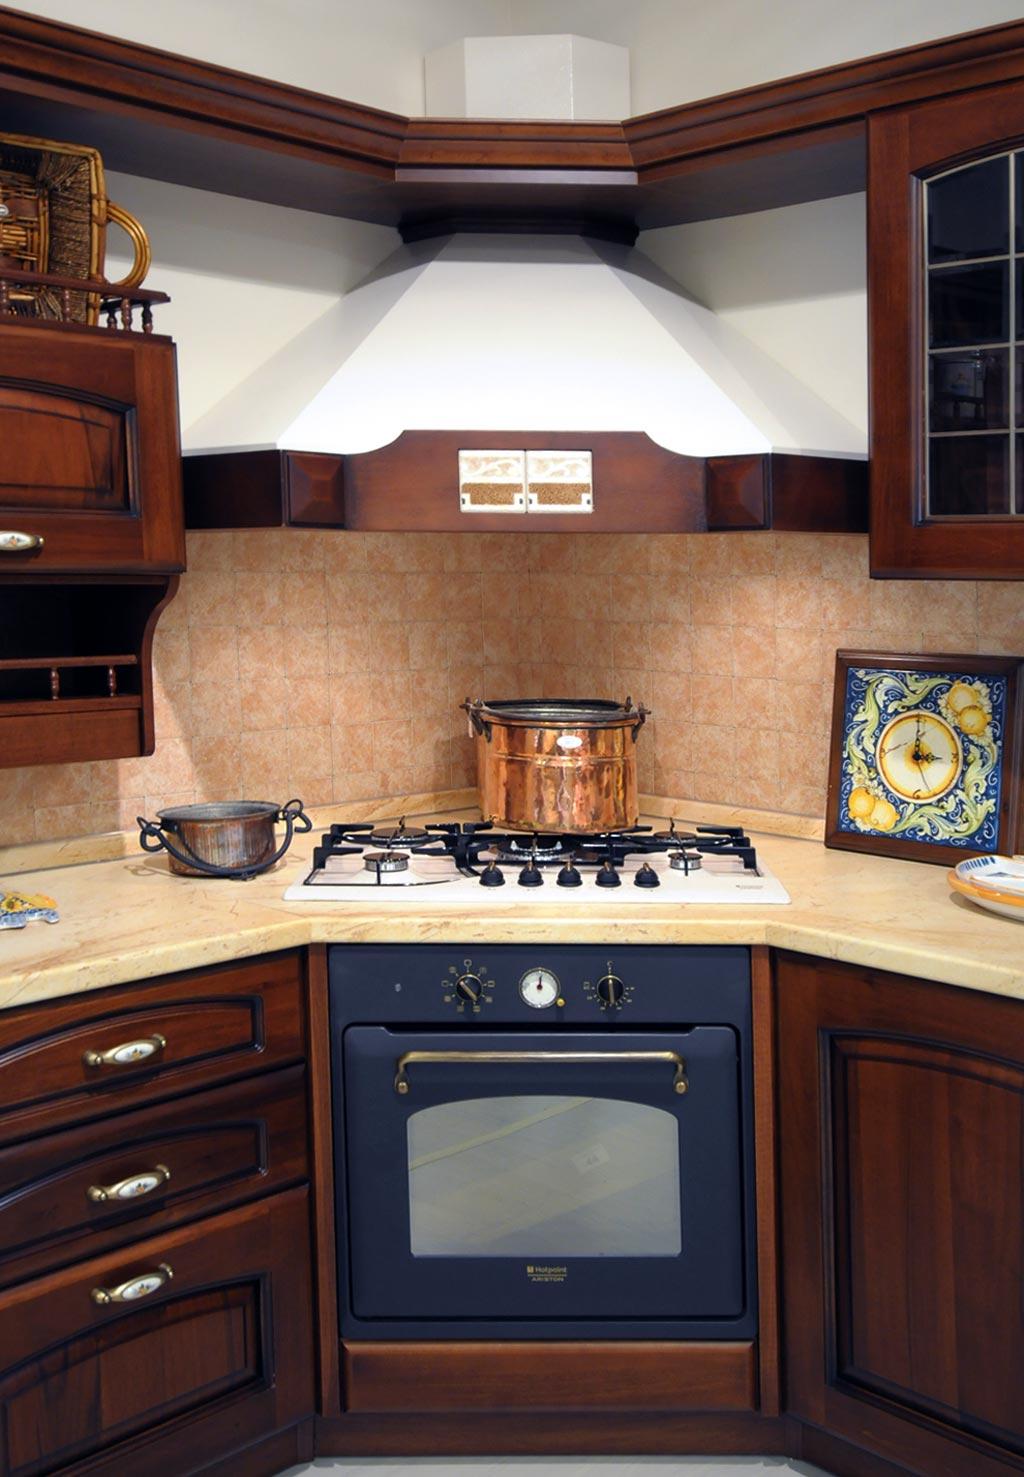 Cucina classica Elena - Rivenditori cucine Sicilia